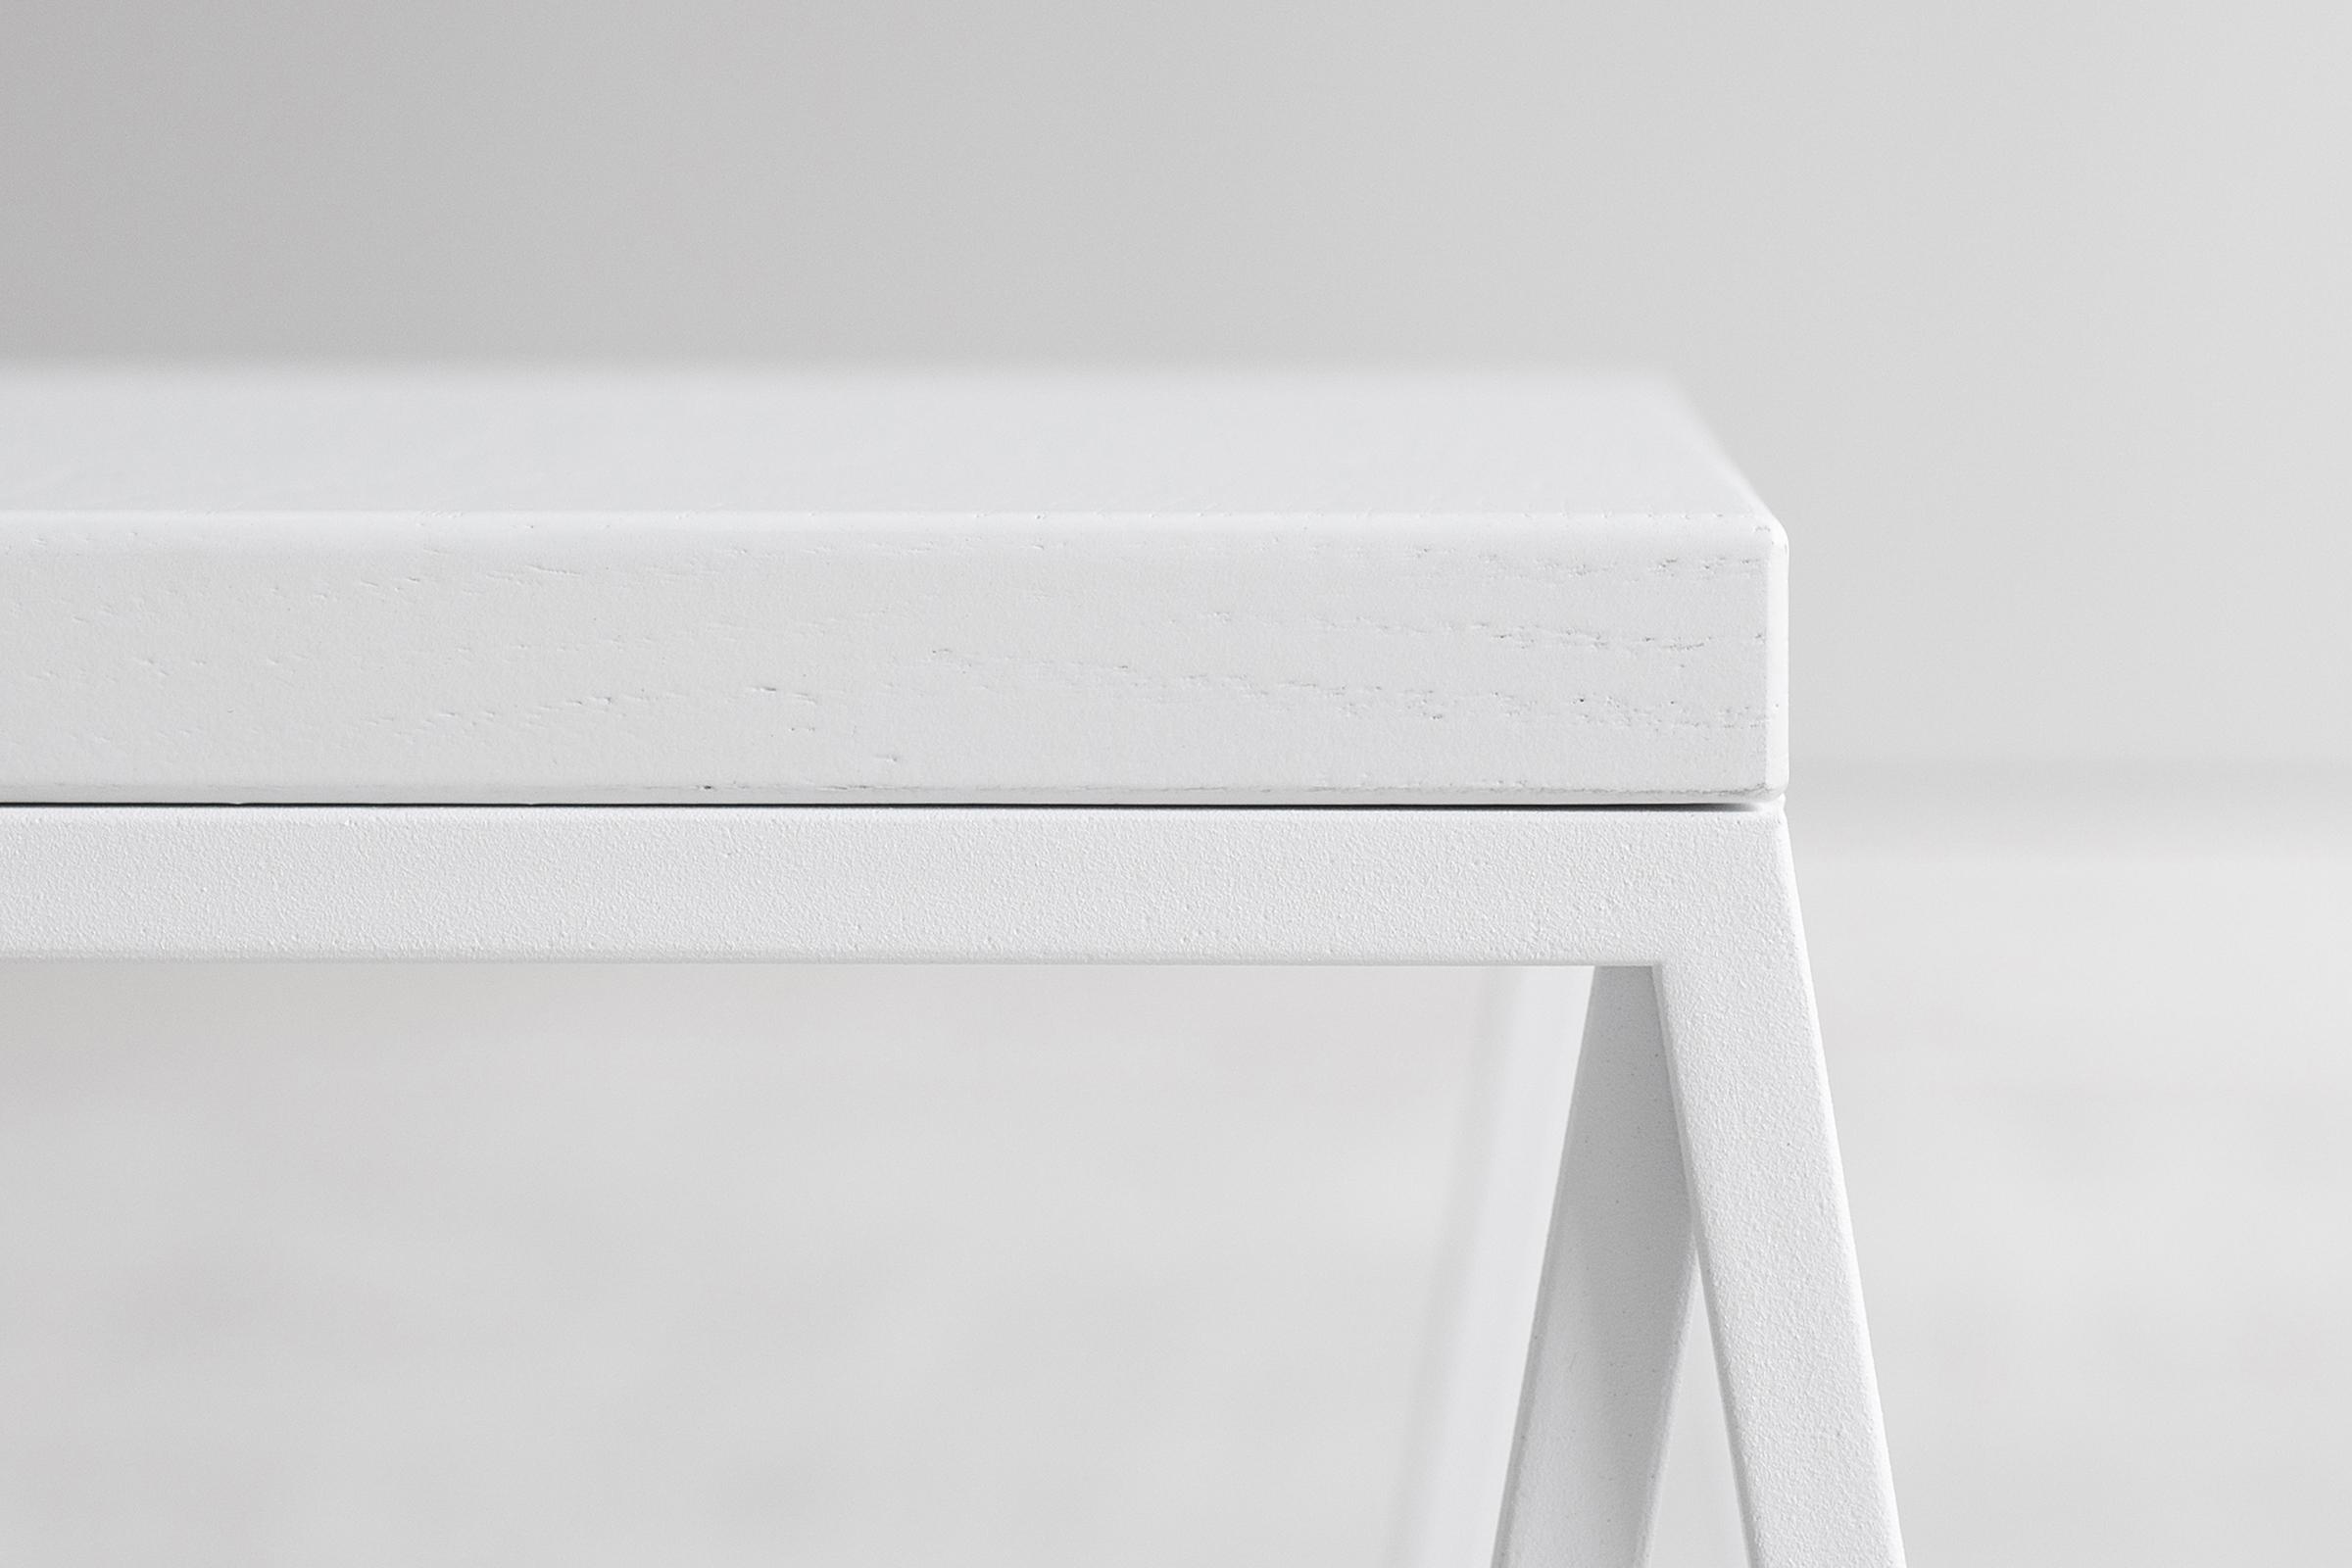 Rhomboid side object white detail